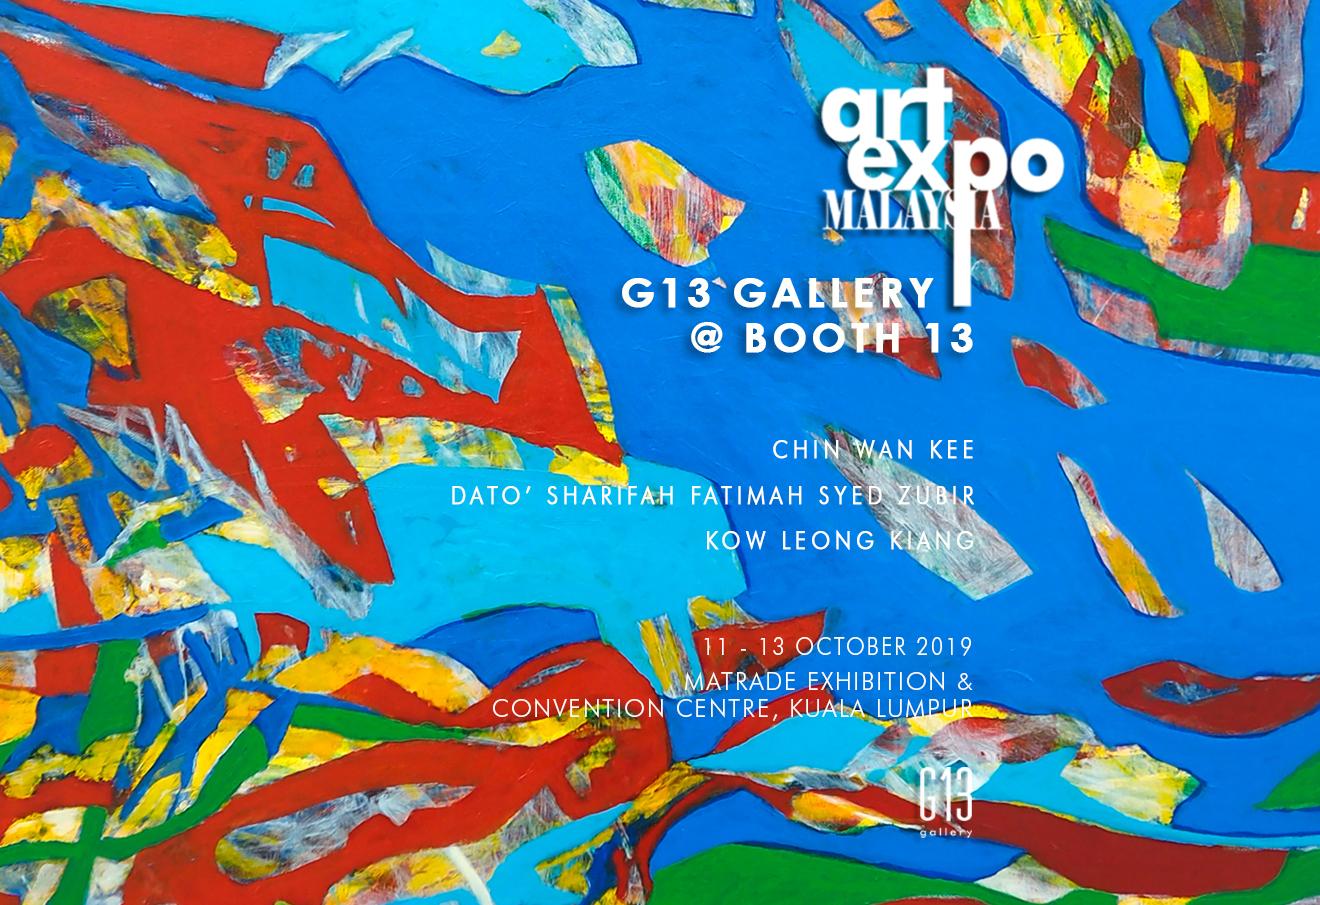 Art Expo Malaysia 2019 @ BOOTH 13